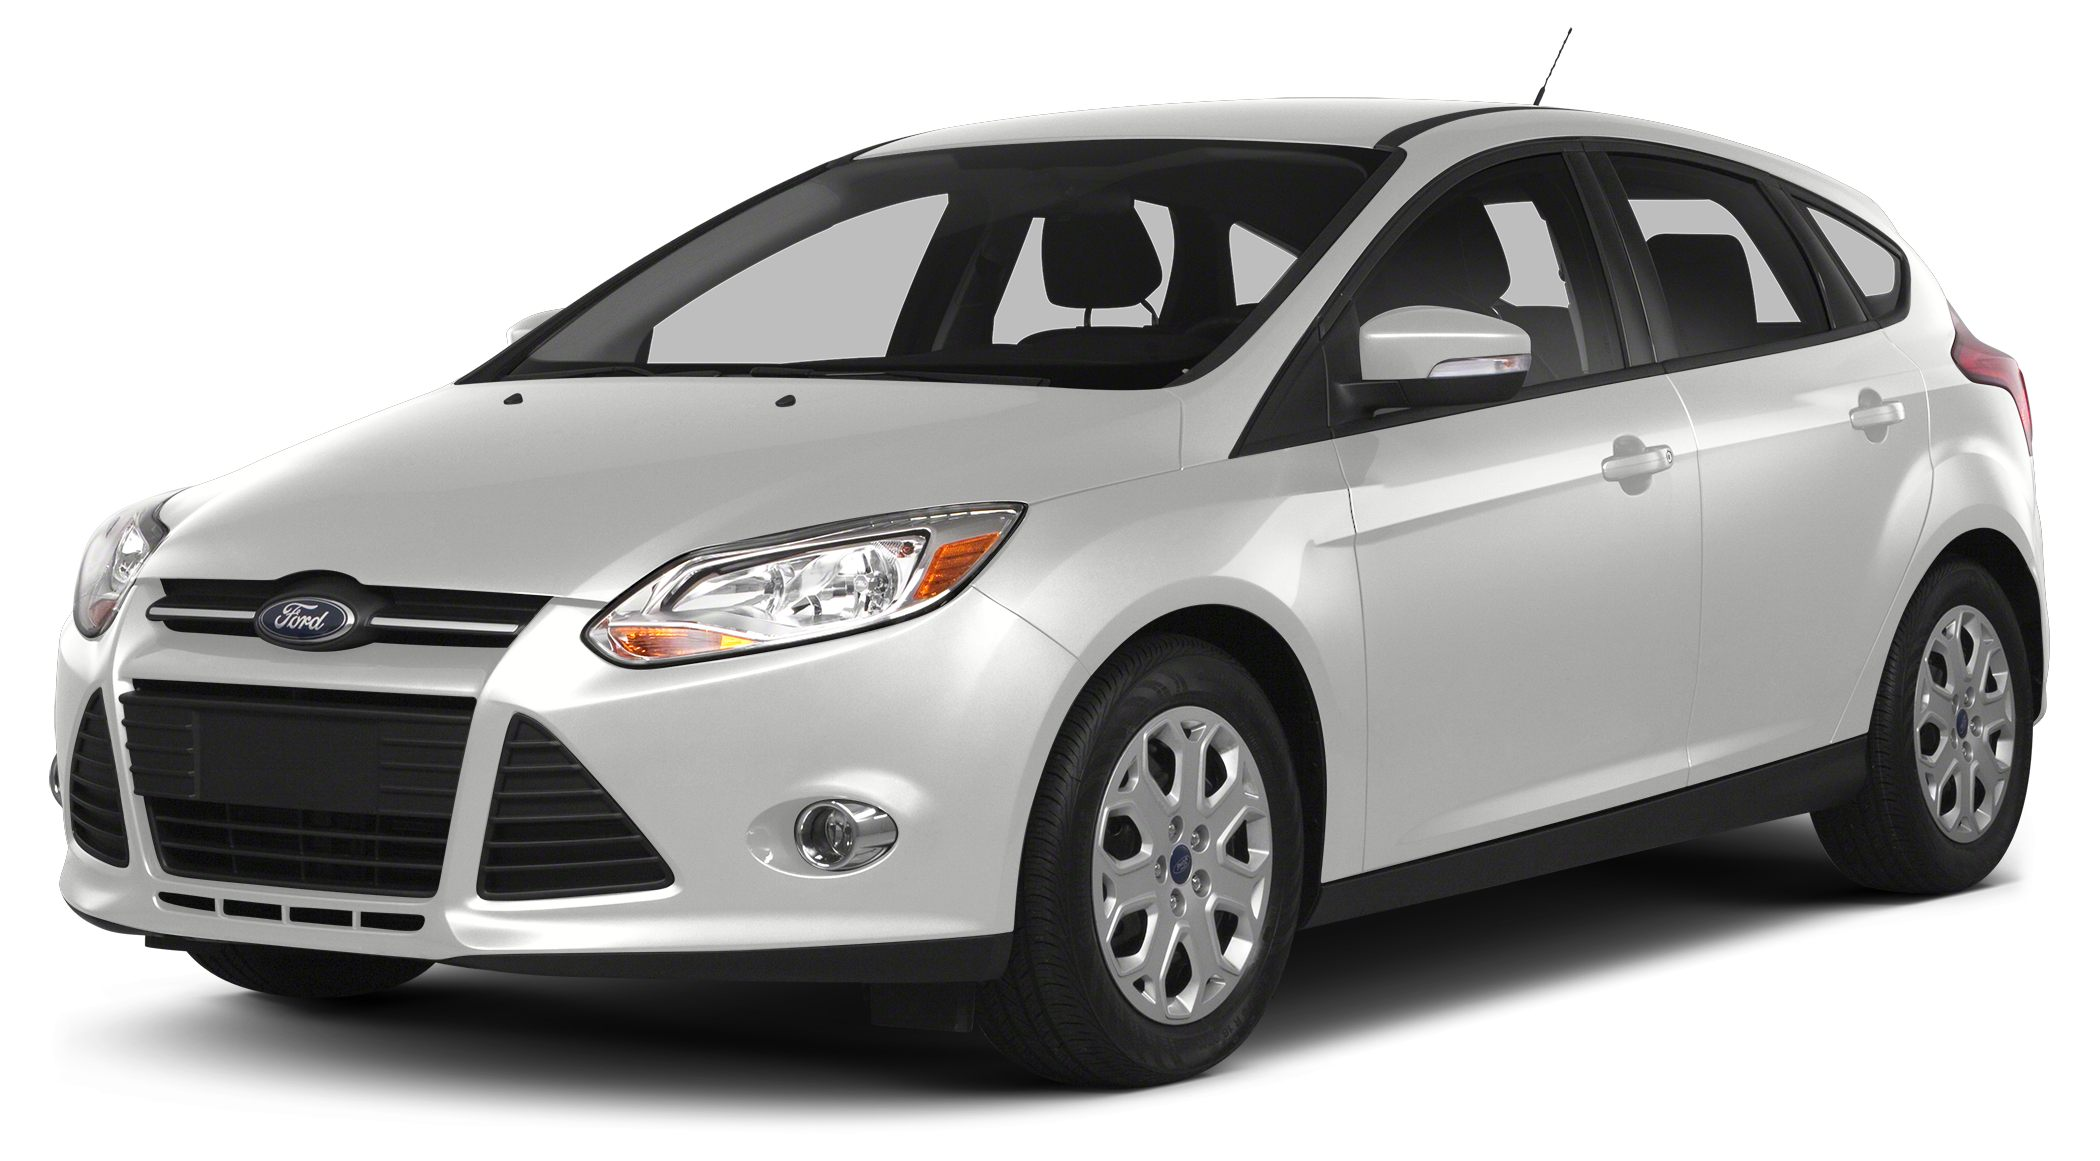 2014 Ford Focus SE Miles 41121Color Oxford White Stock EL265771 VIN 1FADP3K22EL265771